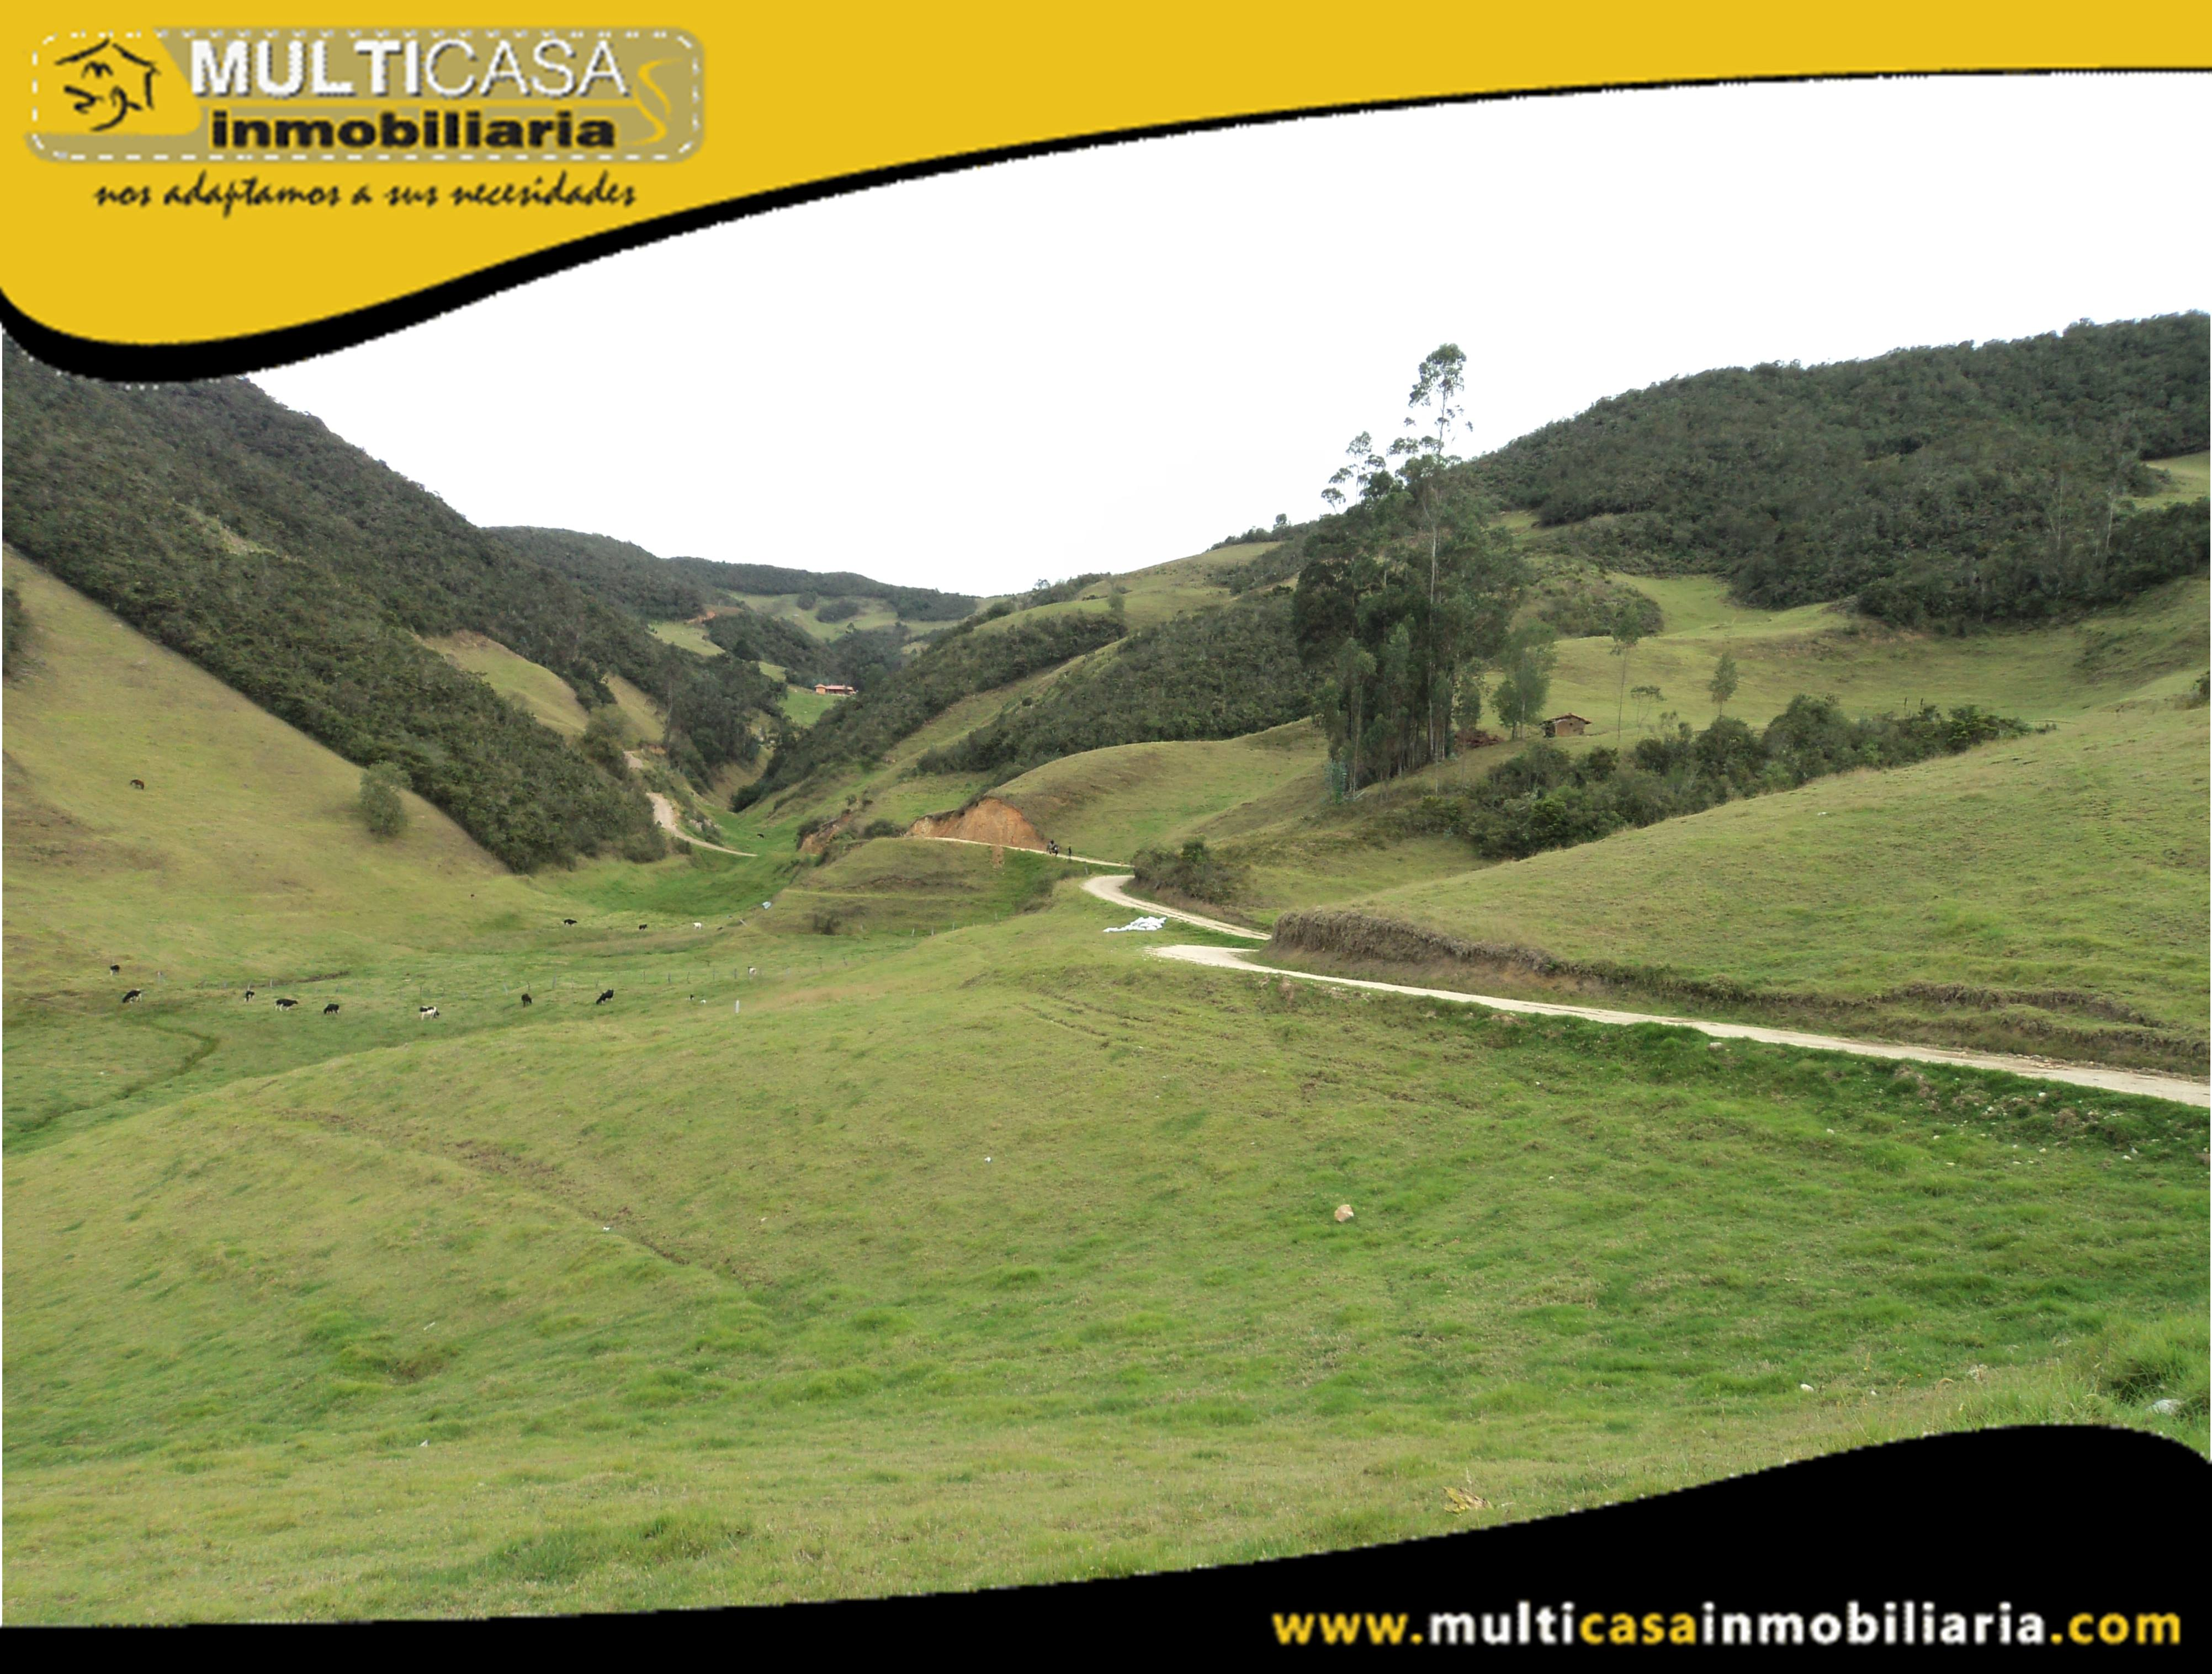 Venta de Hermoso Terreno a crédito Sector Tarqui Cuenca-Ecuador